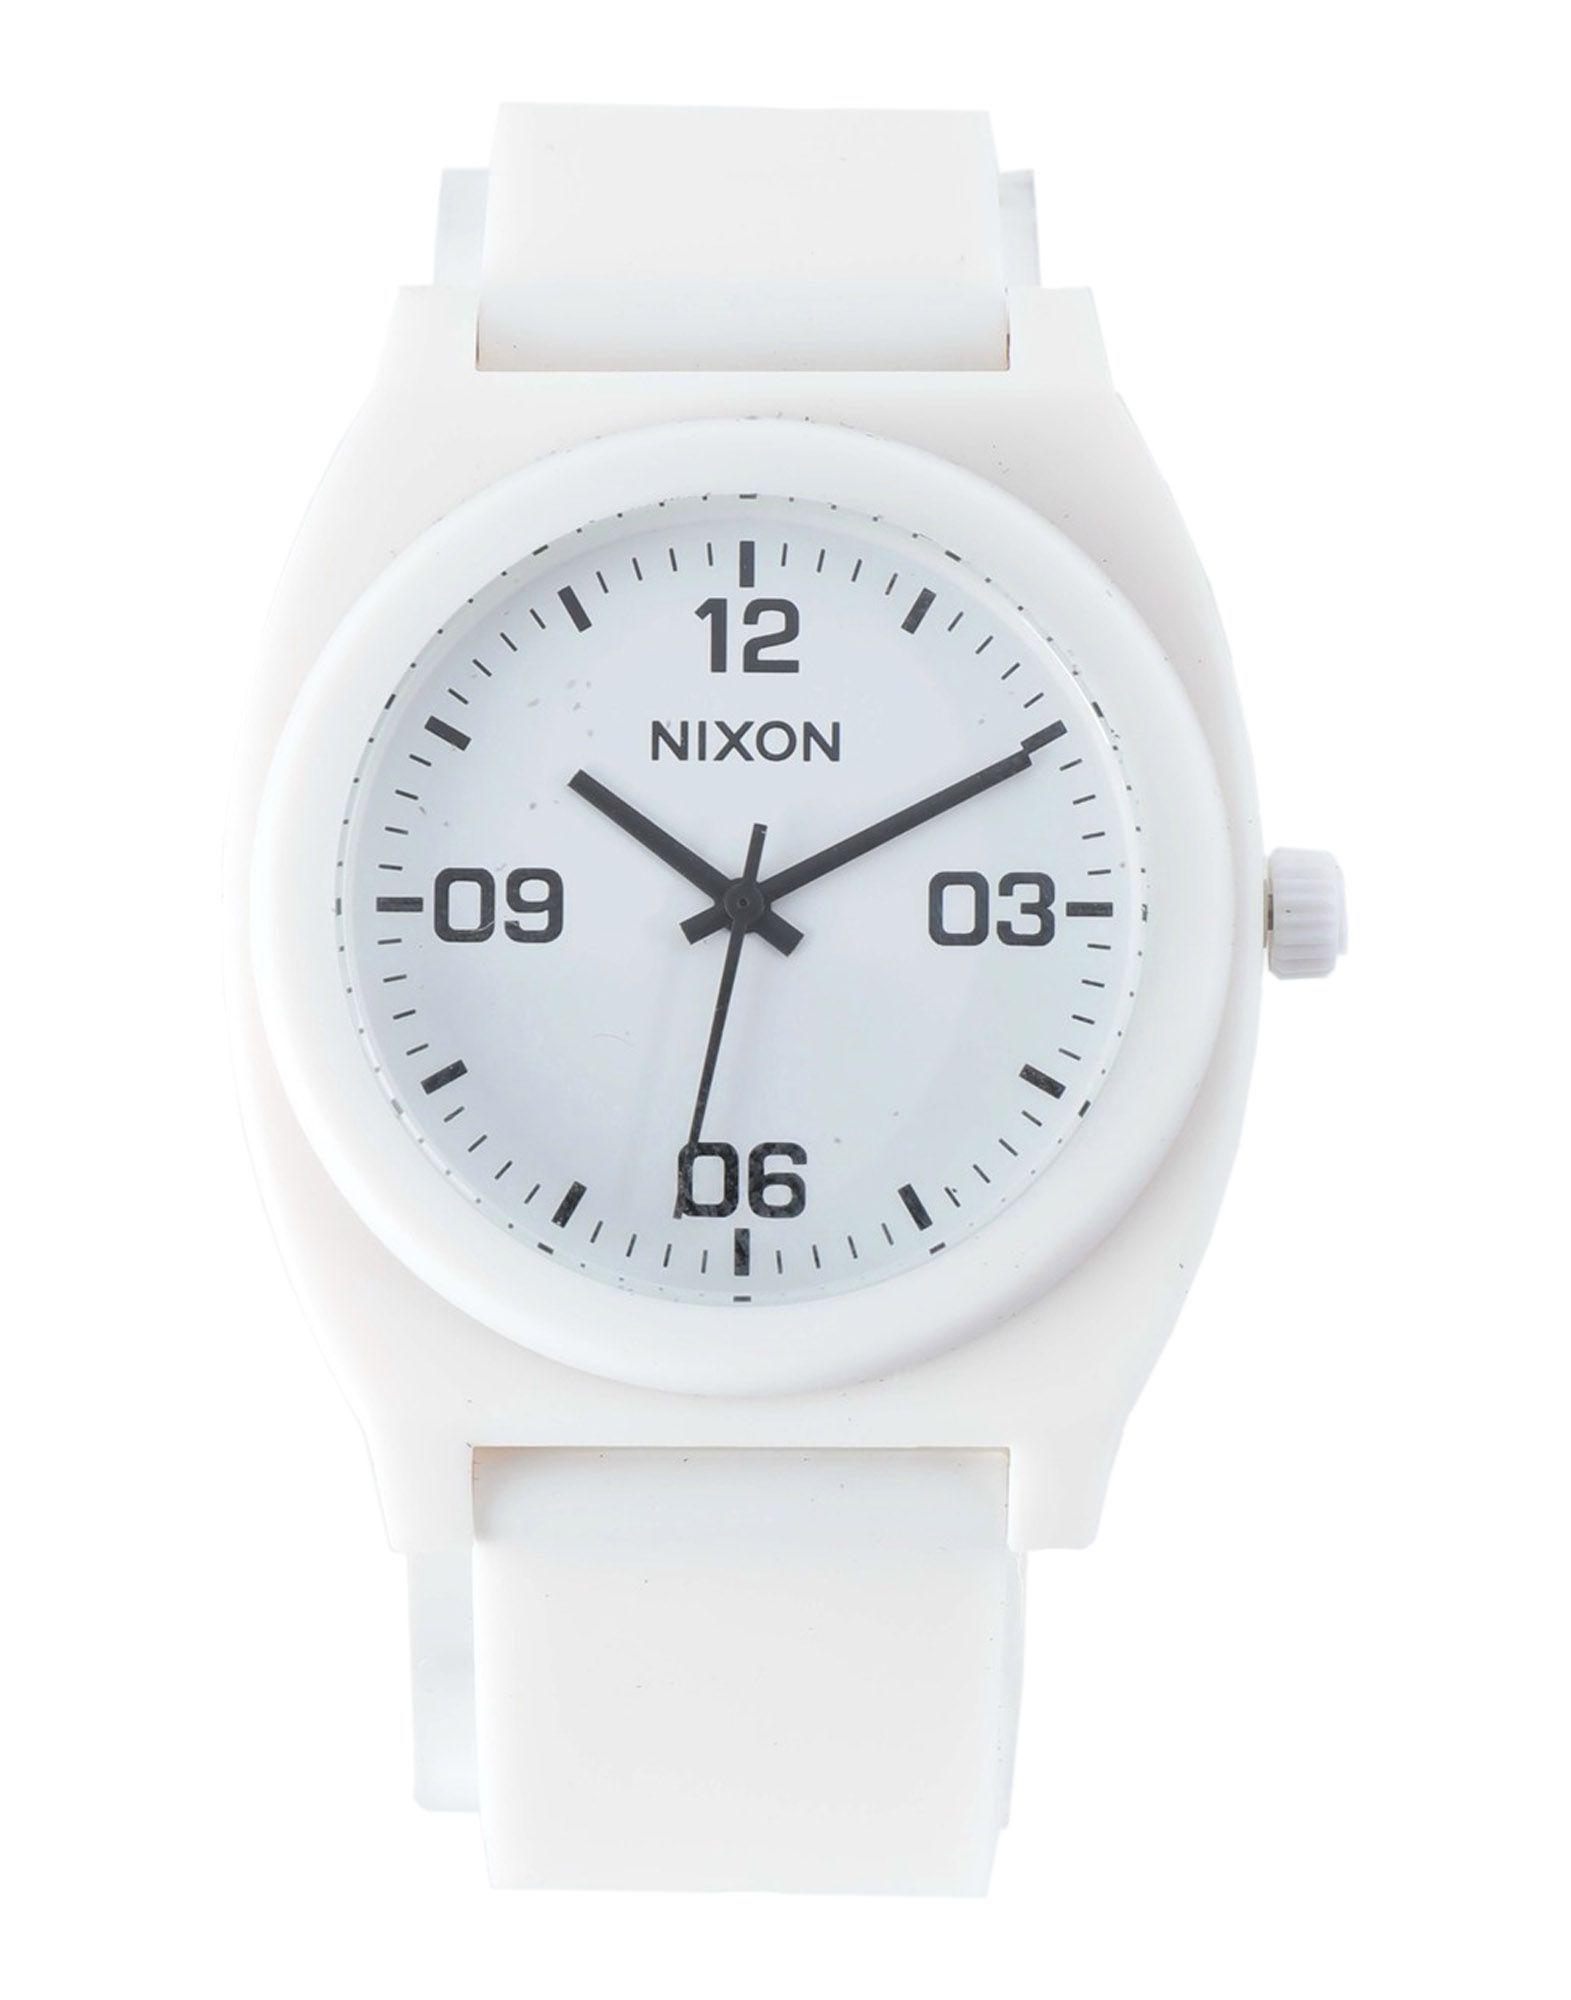 Nixon White Water Resistant Analogue Watch